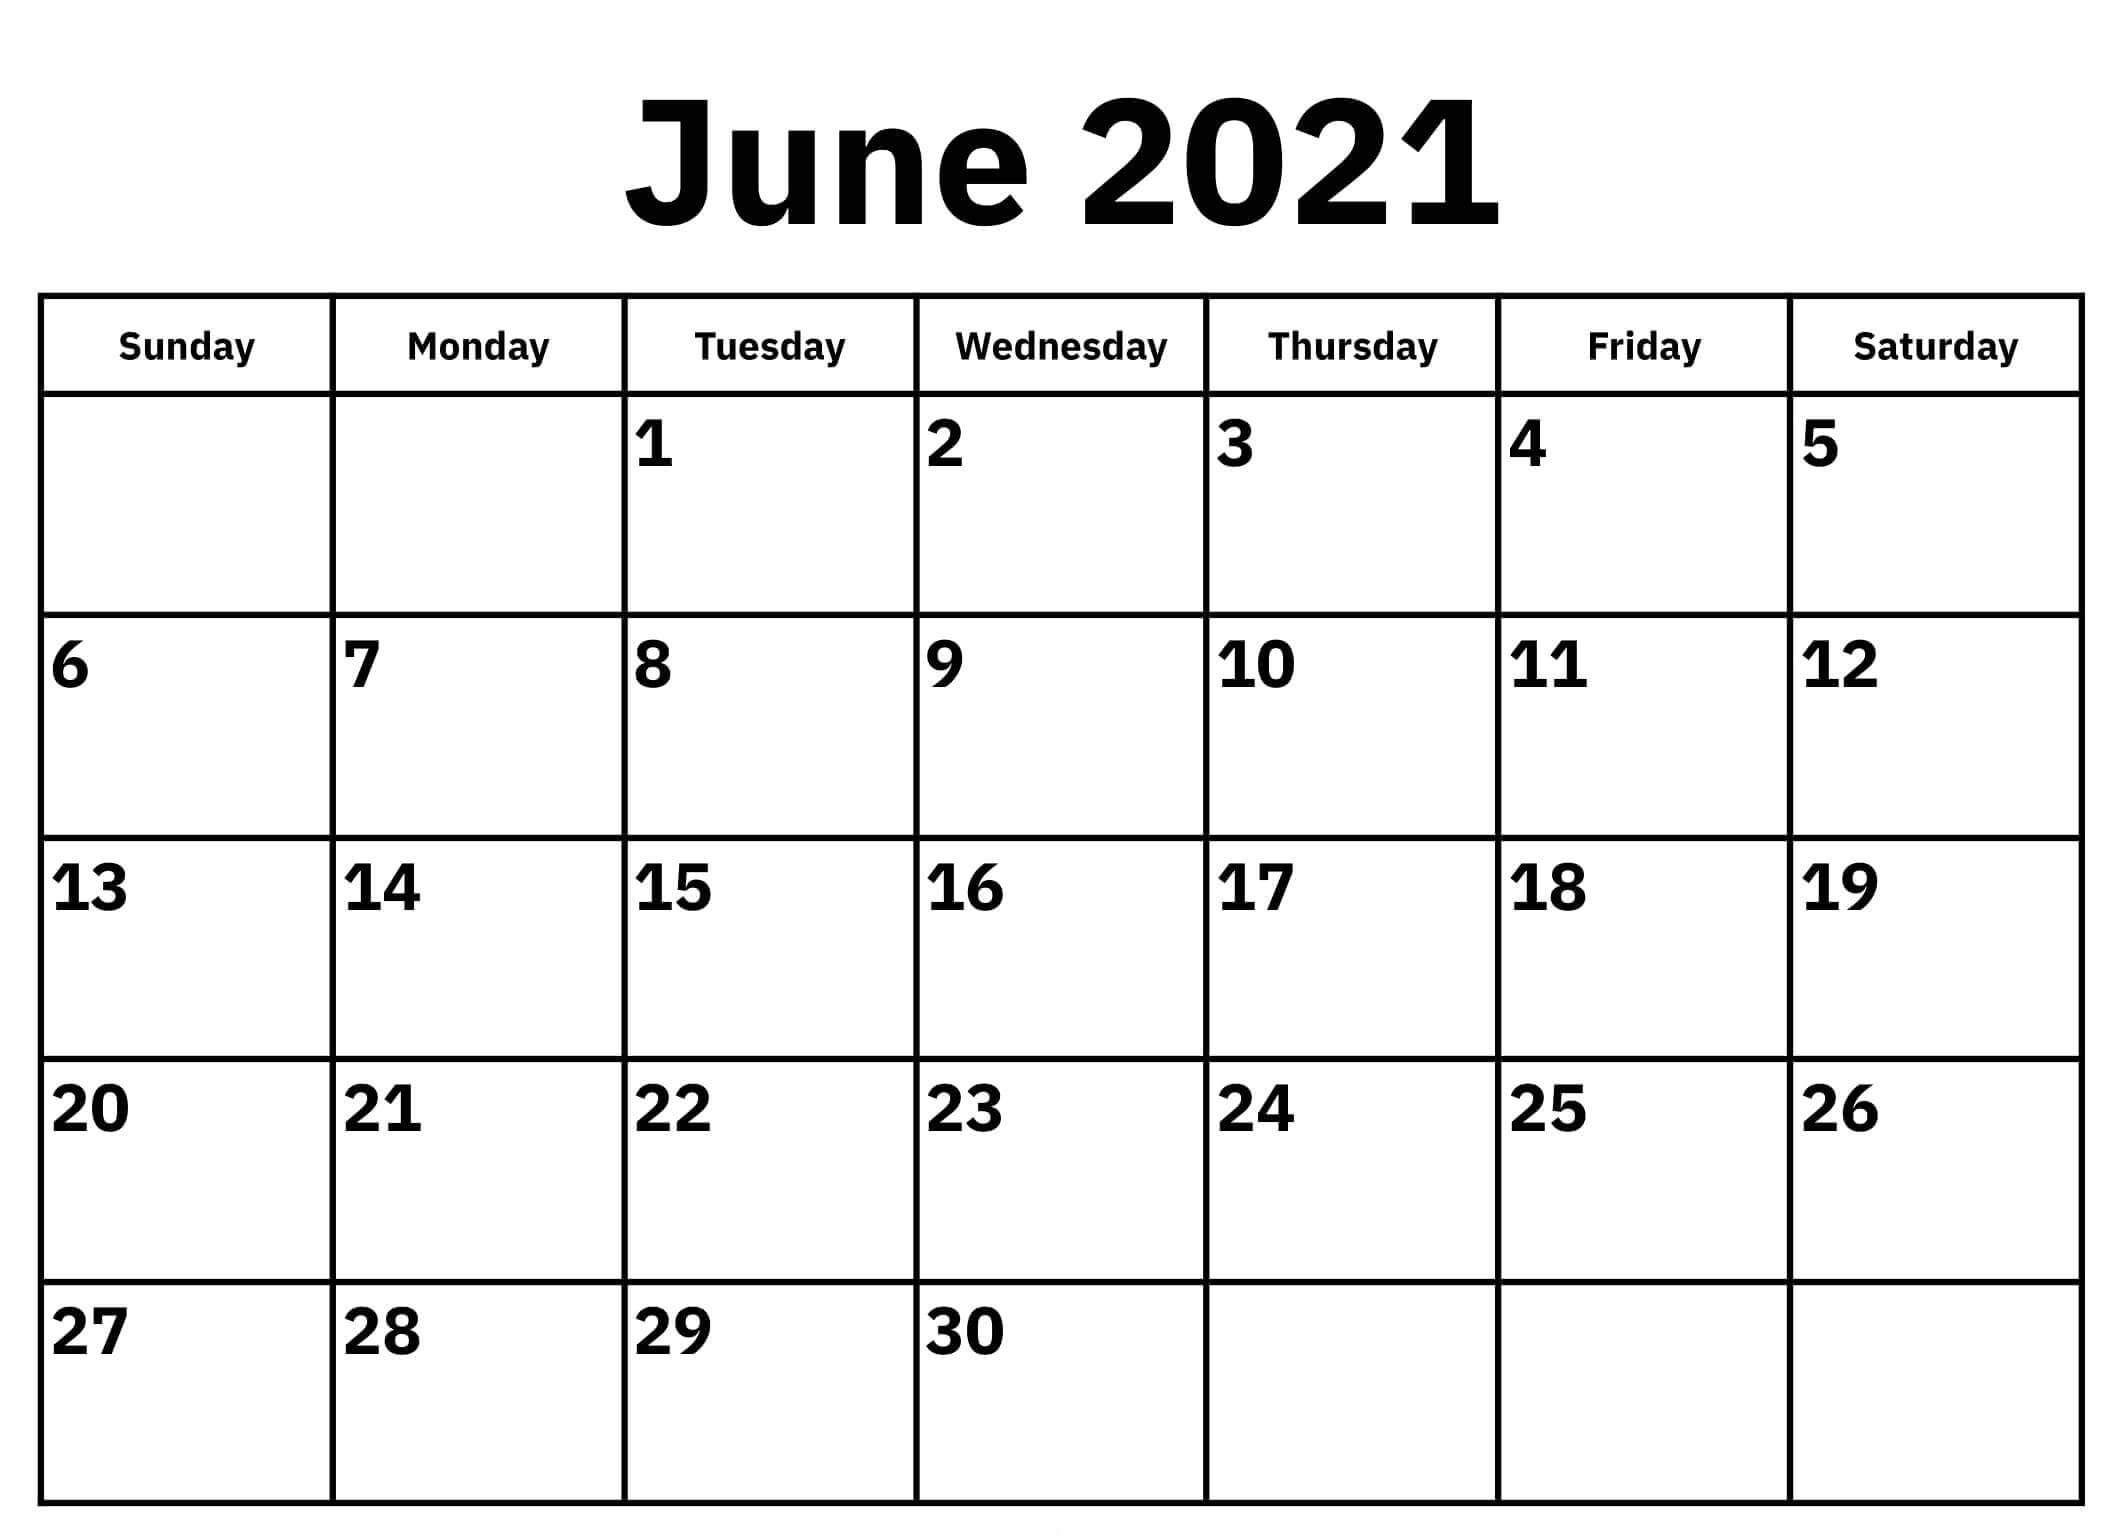 June 2021 Calendar Editable Template